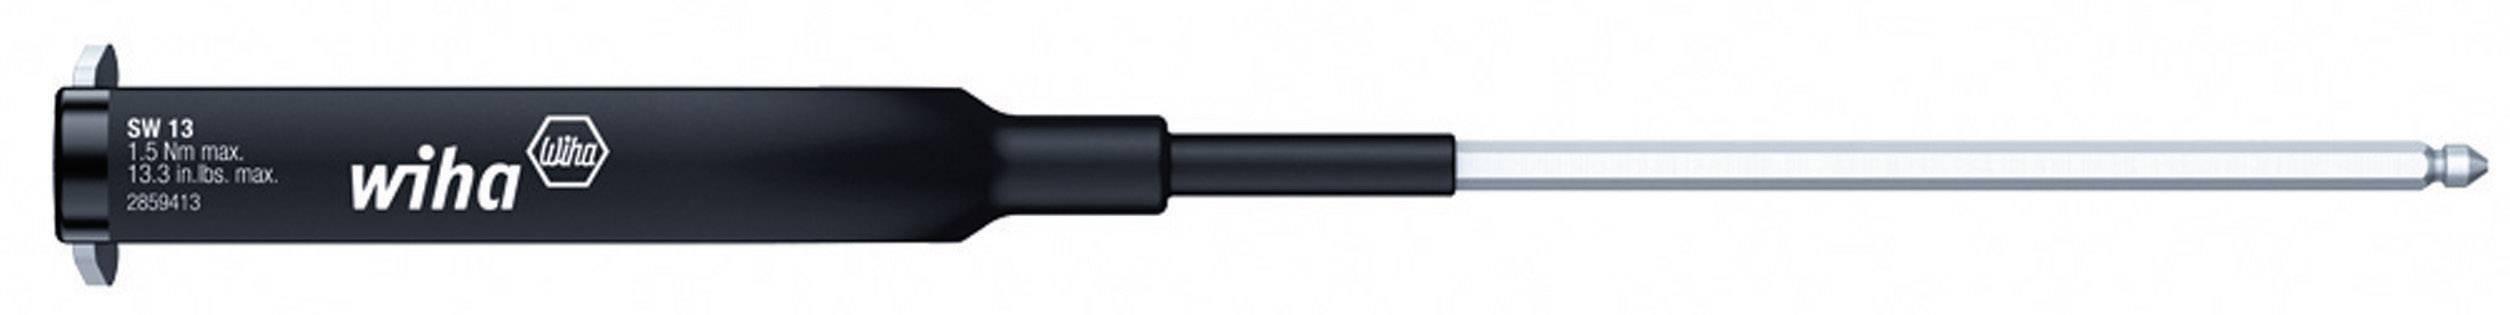 Bit momentového kľúča Wiha Torque 2859 36416, 218 mm